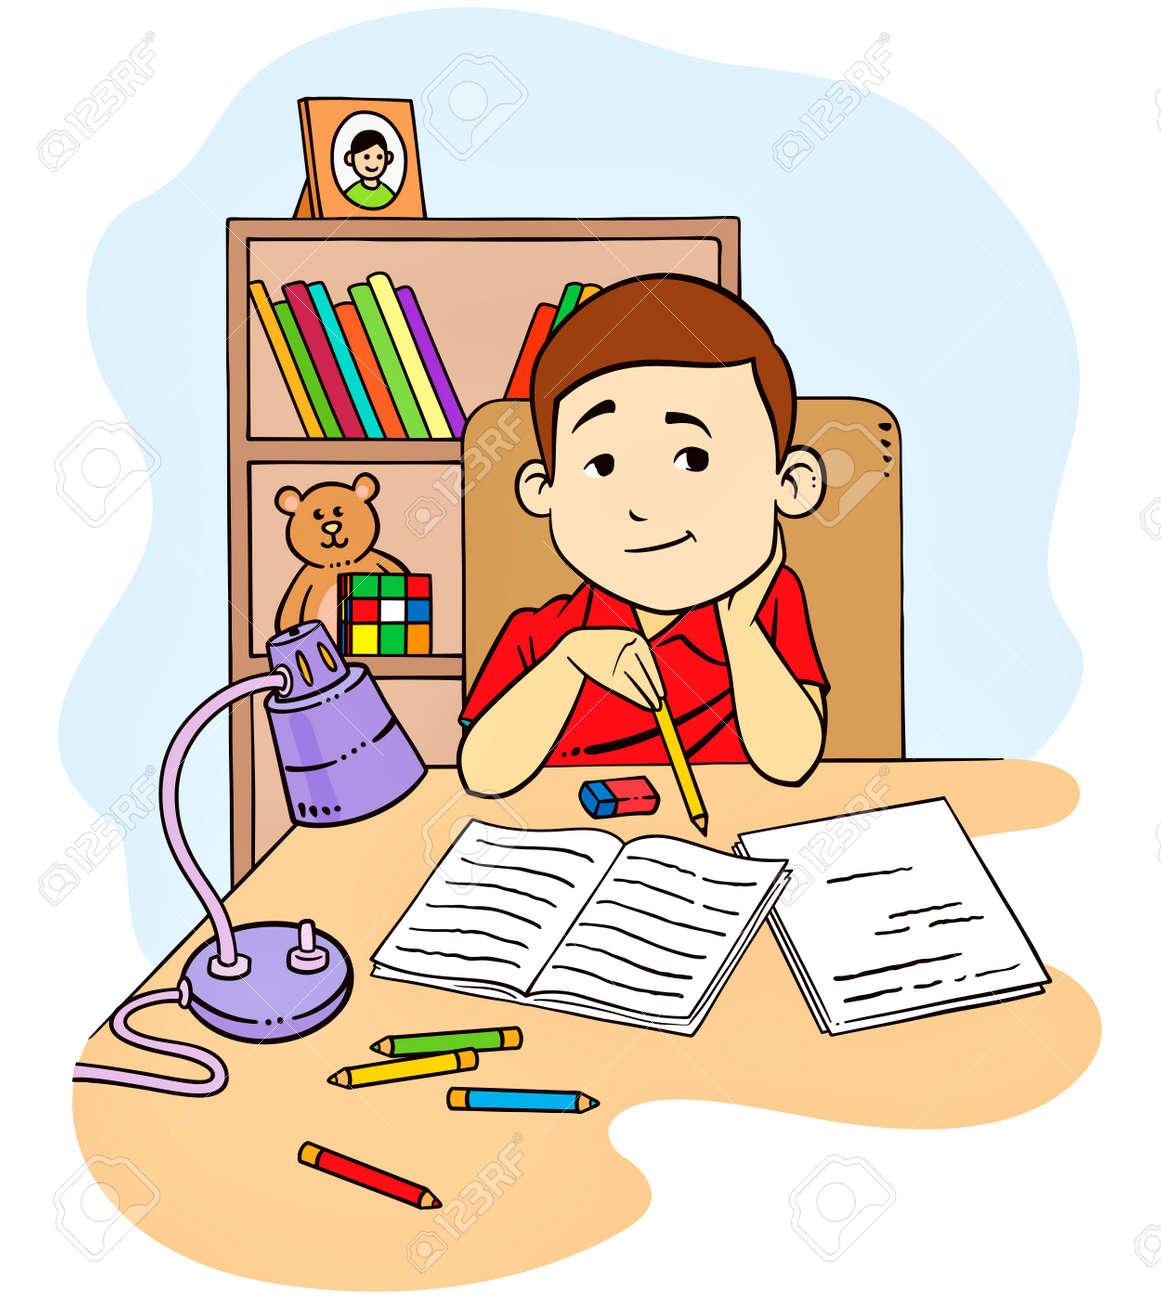 Legit paper writing services